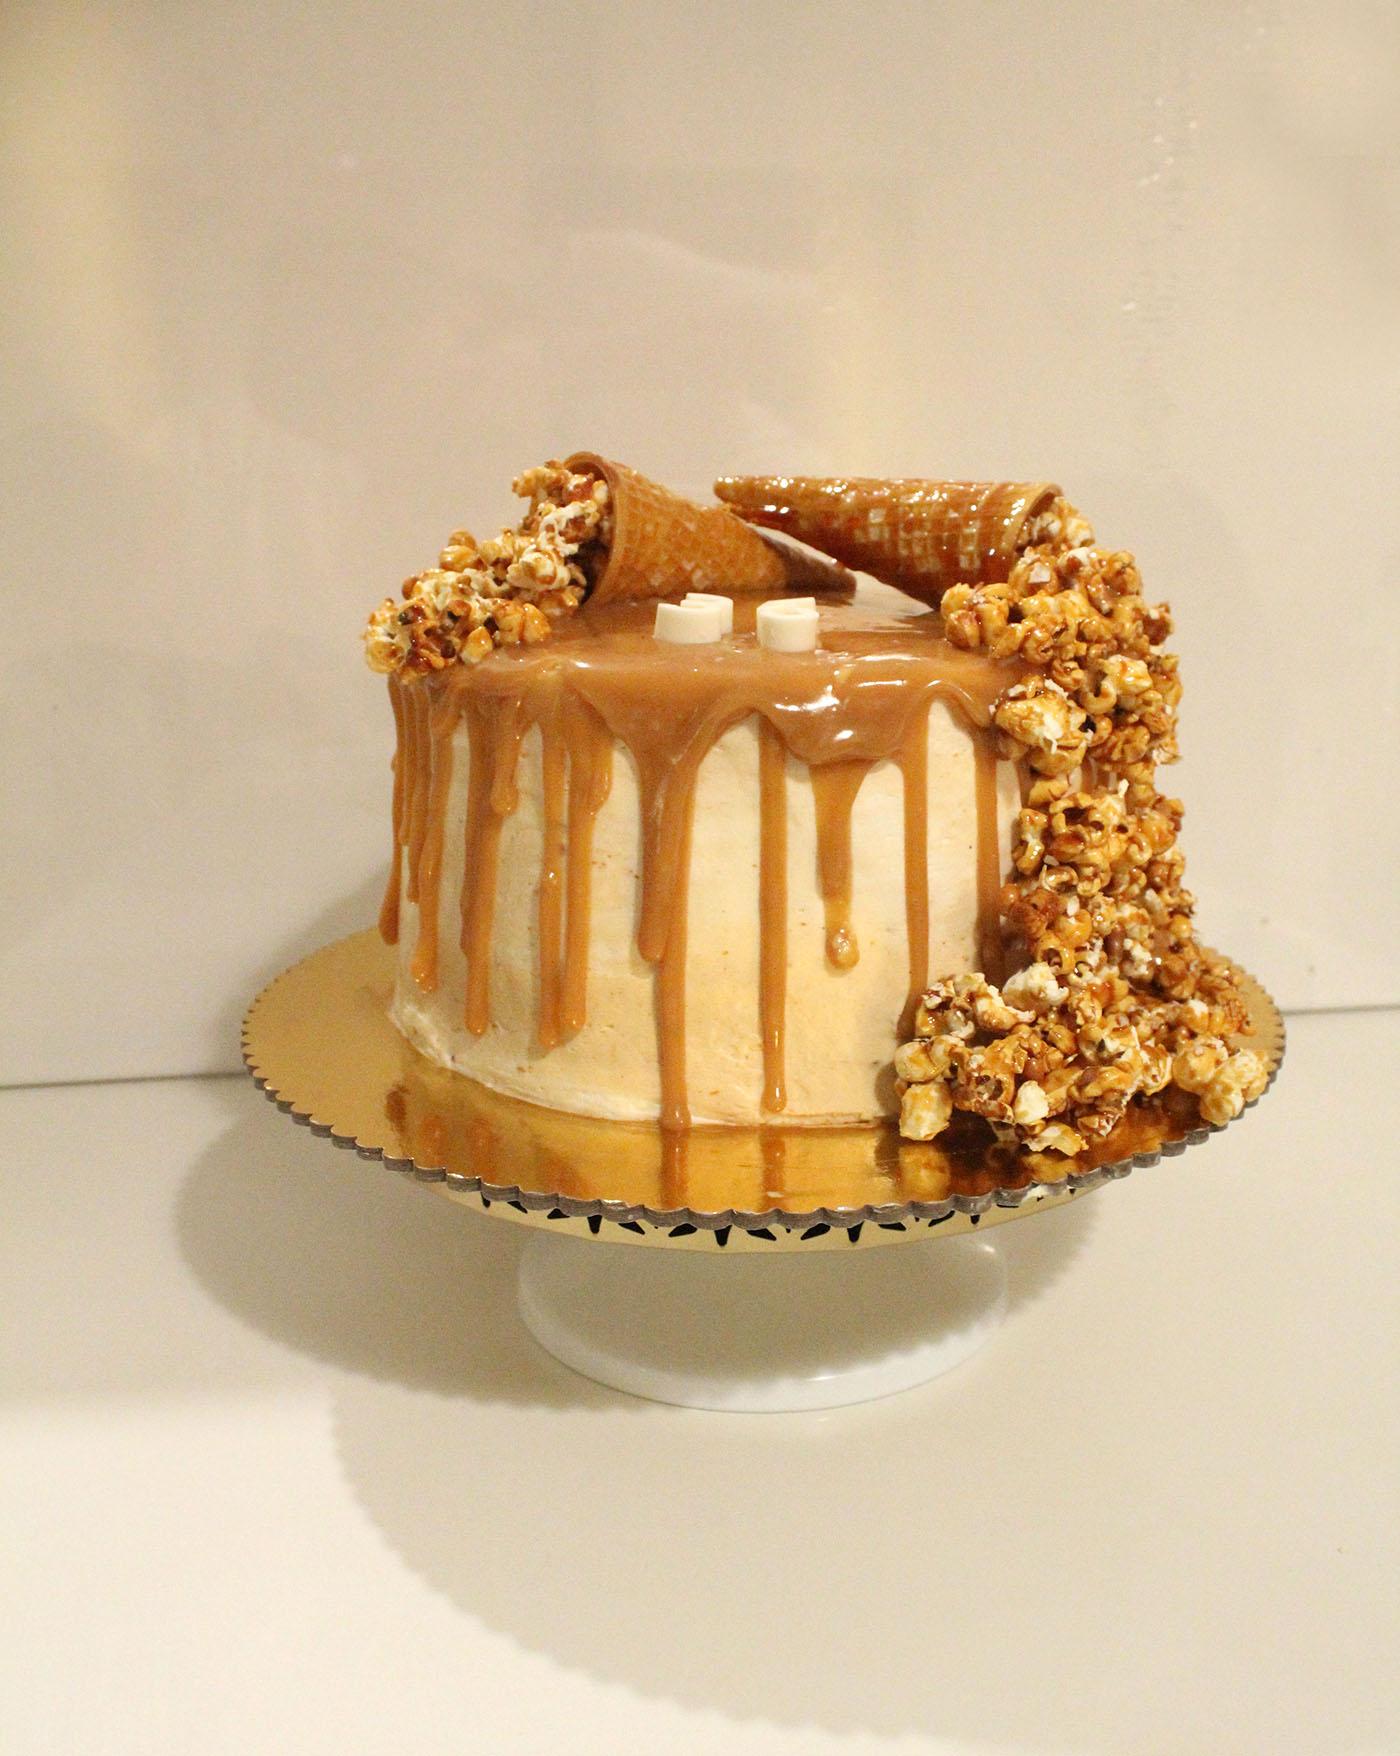 IMG 9461 - עוגת זילוף